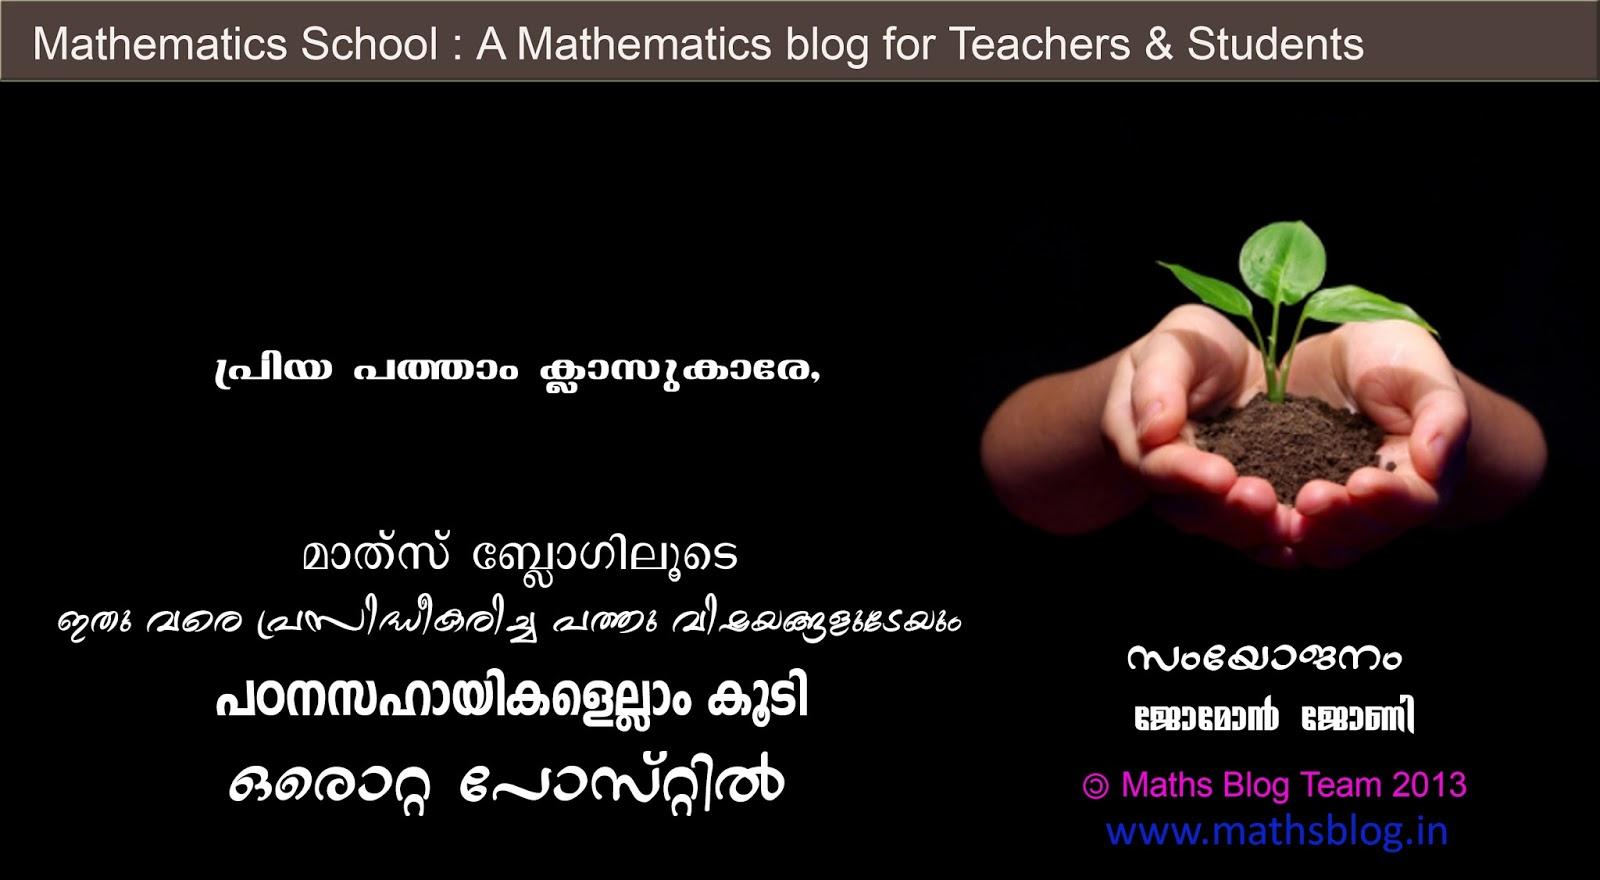 Worksheet Maths Malayalam Questions www mathsblog in maths blog for school teachers students sslc 2014